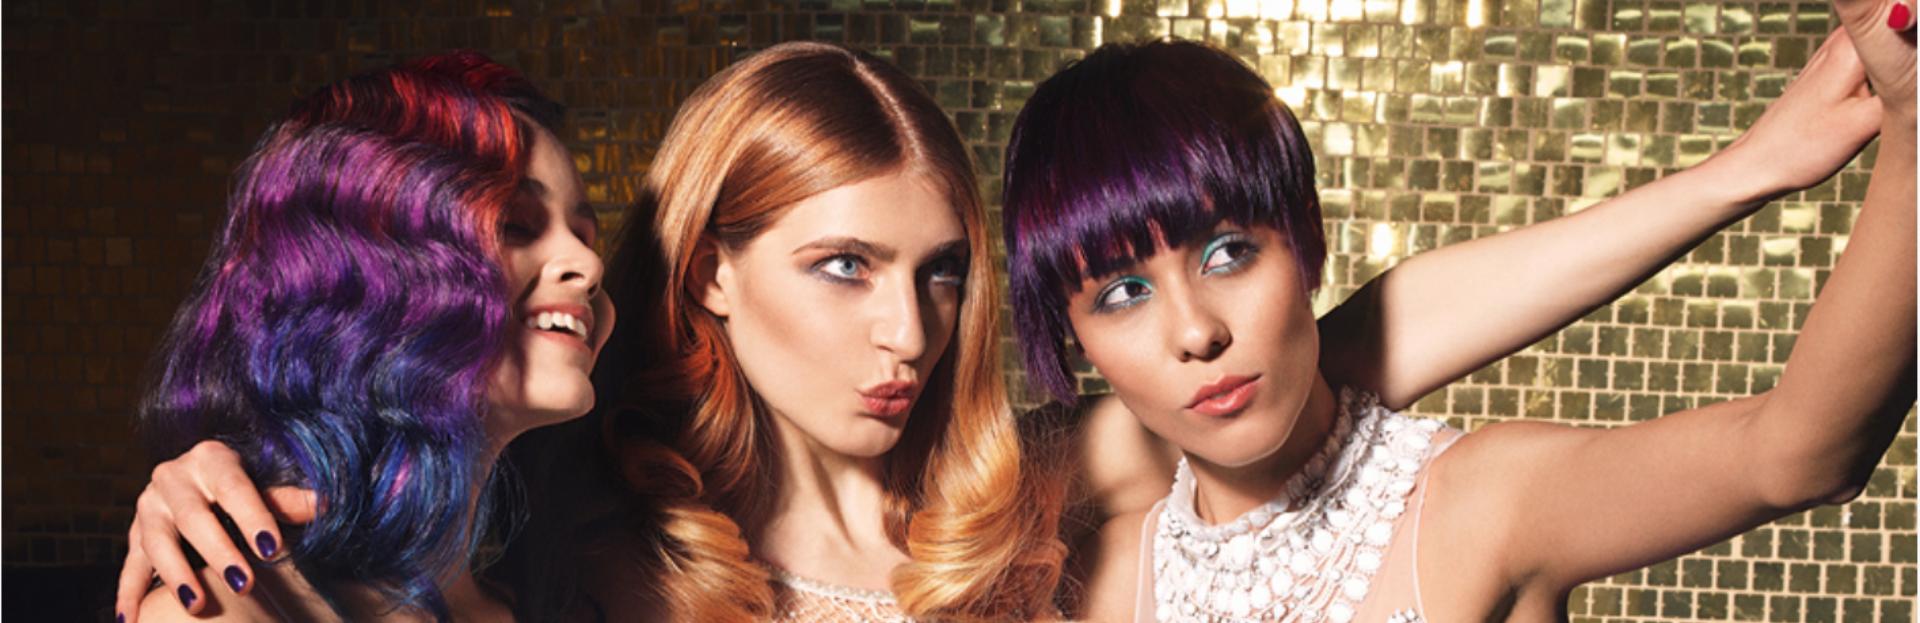 beauty experience shopper hair